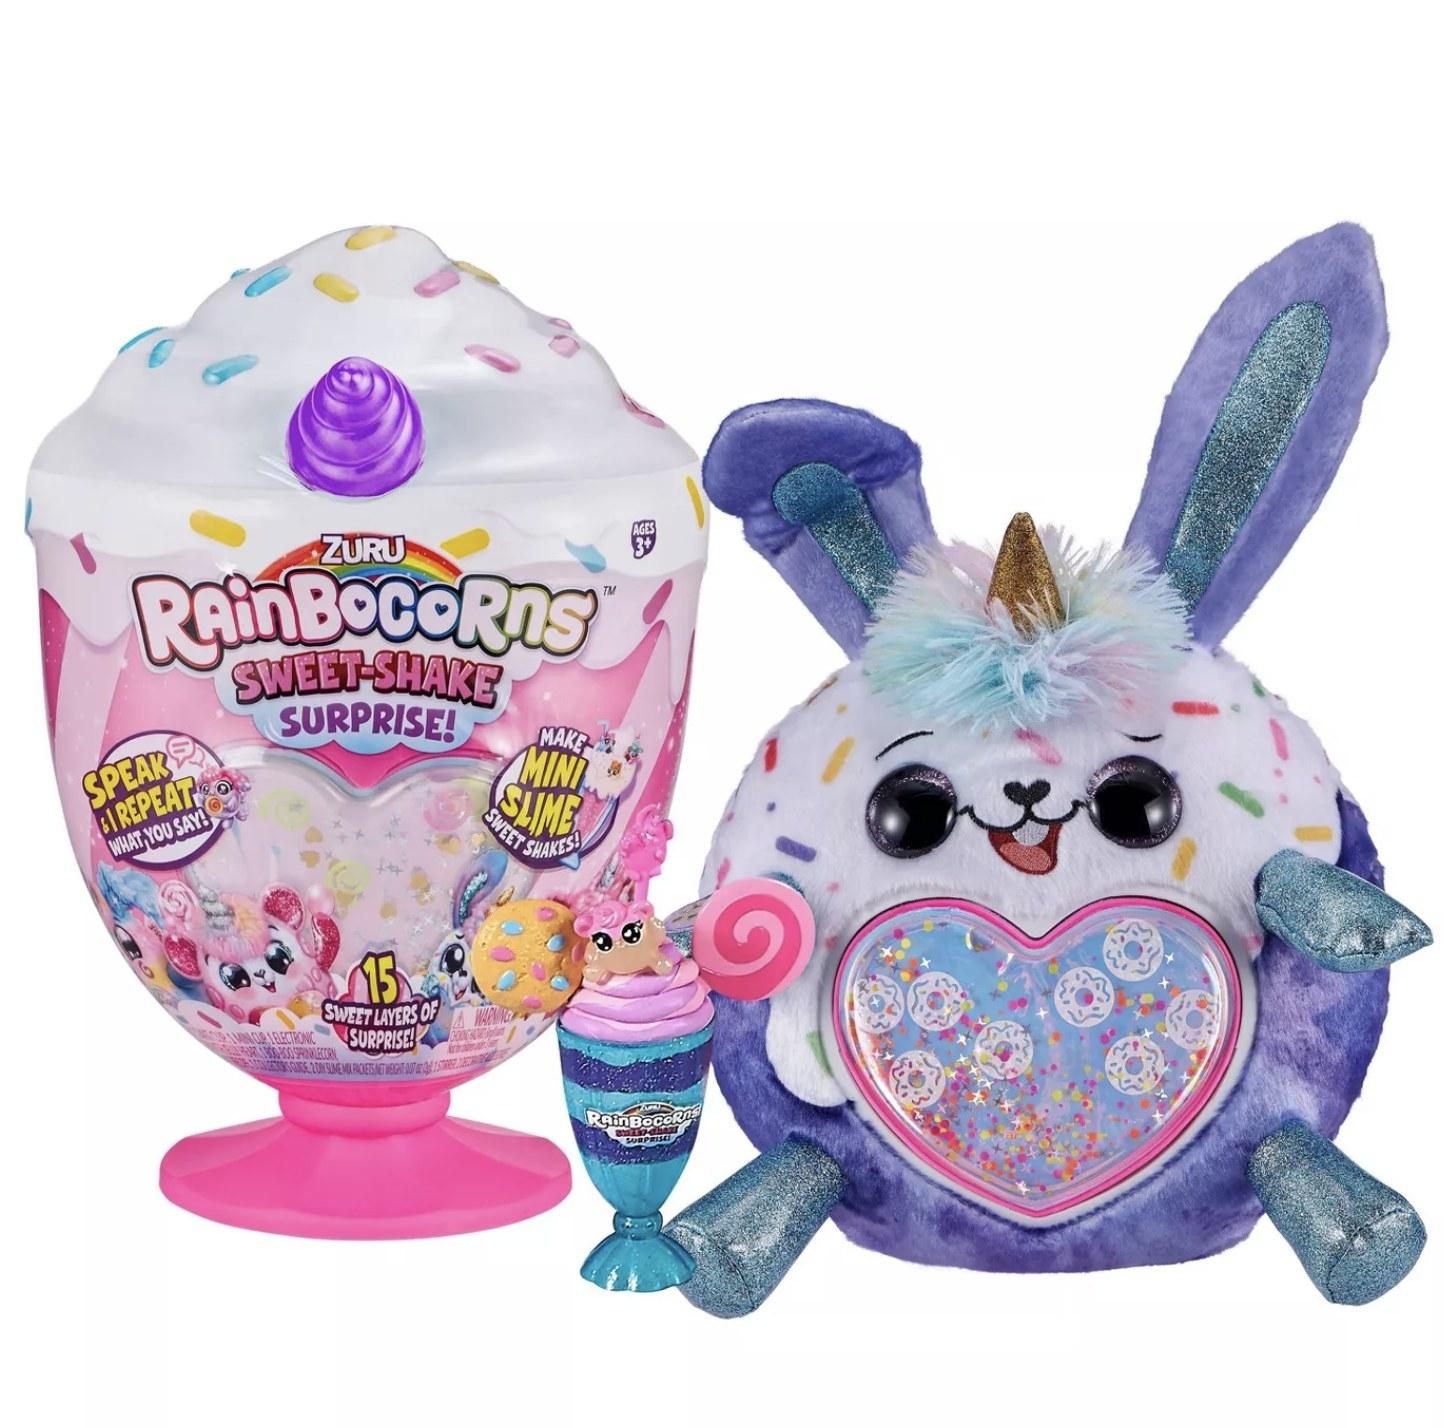 A purple rainbocorn sitting next to a milkshake-shaped toy